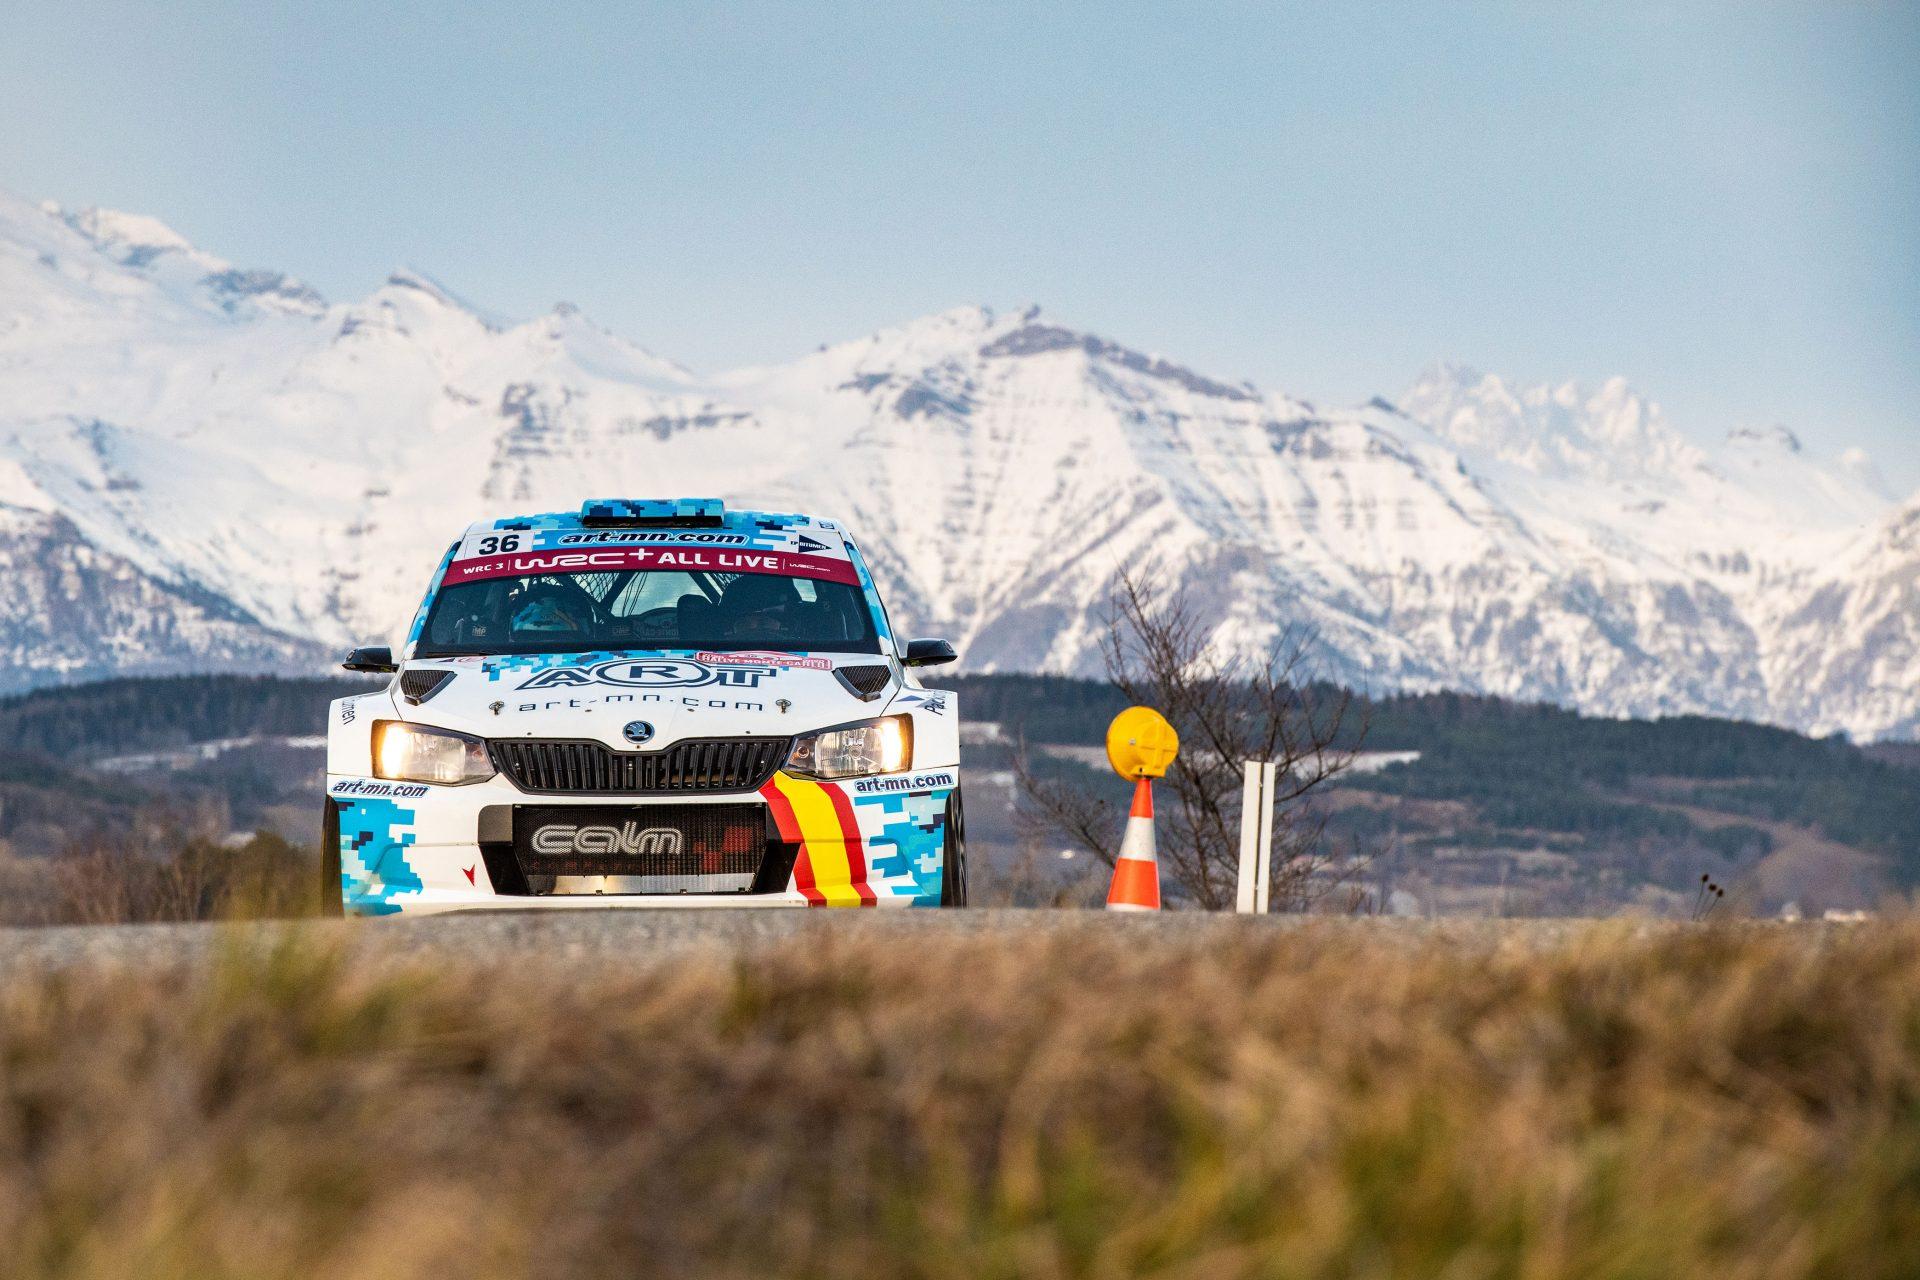 Winter Wonderland. Enjoy the Views of this Year's Rallye Monte Carlo | Gallery